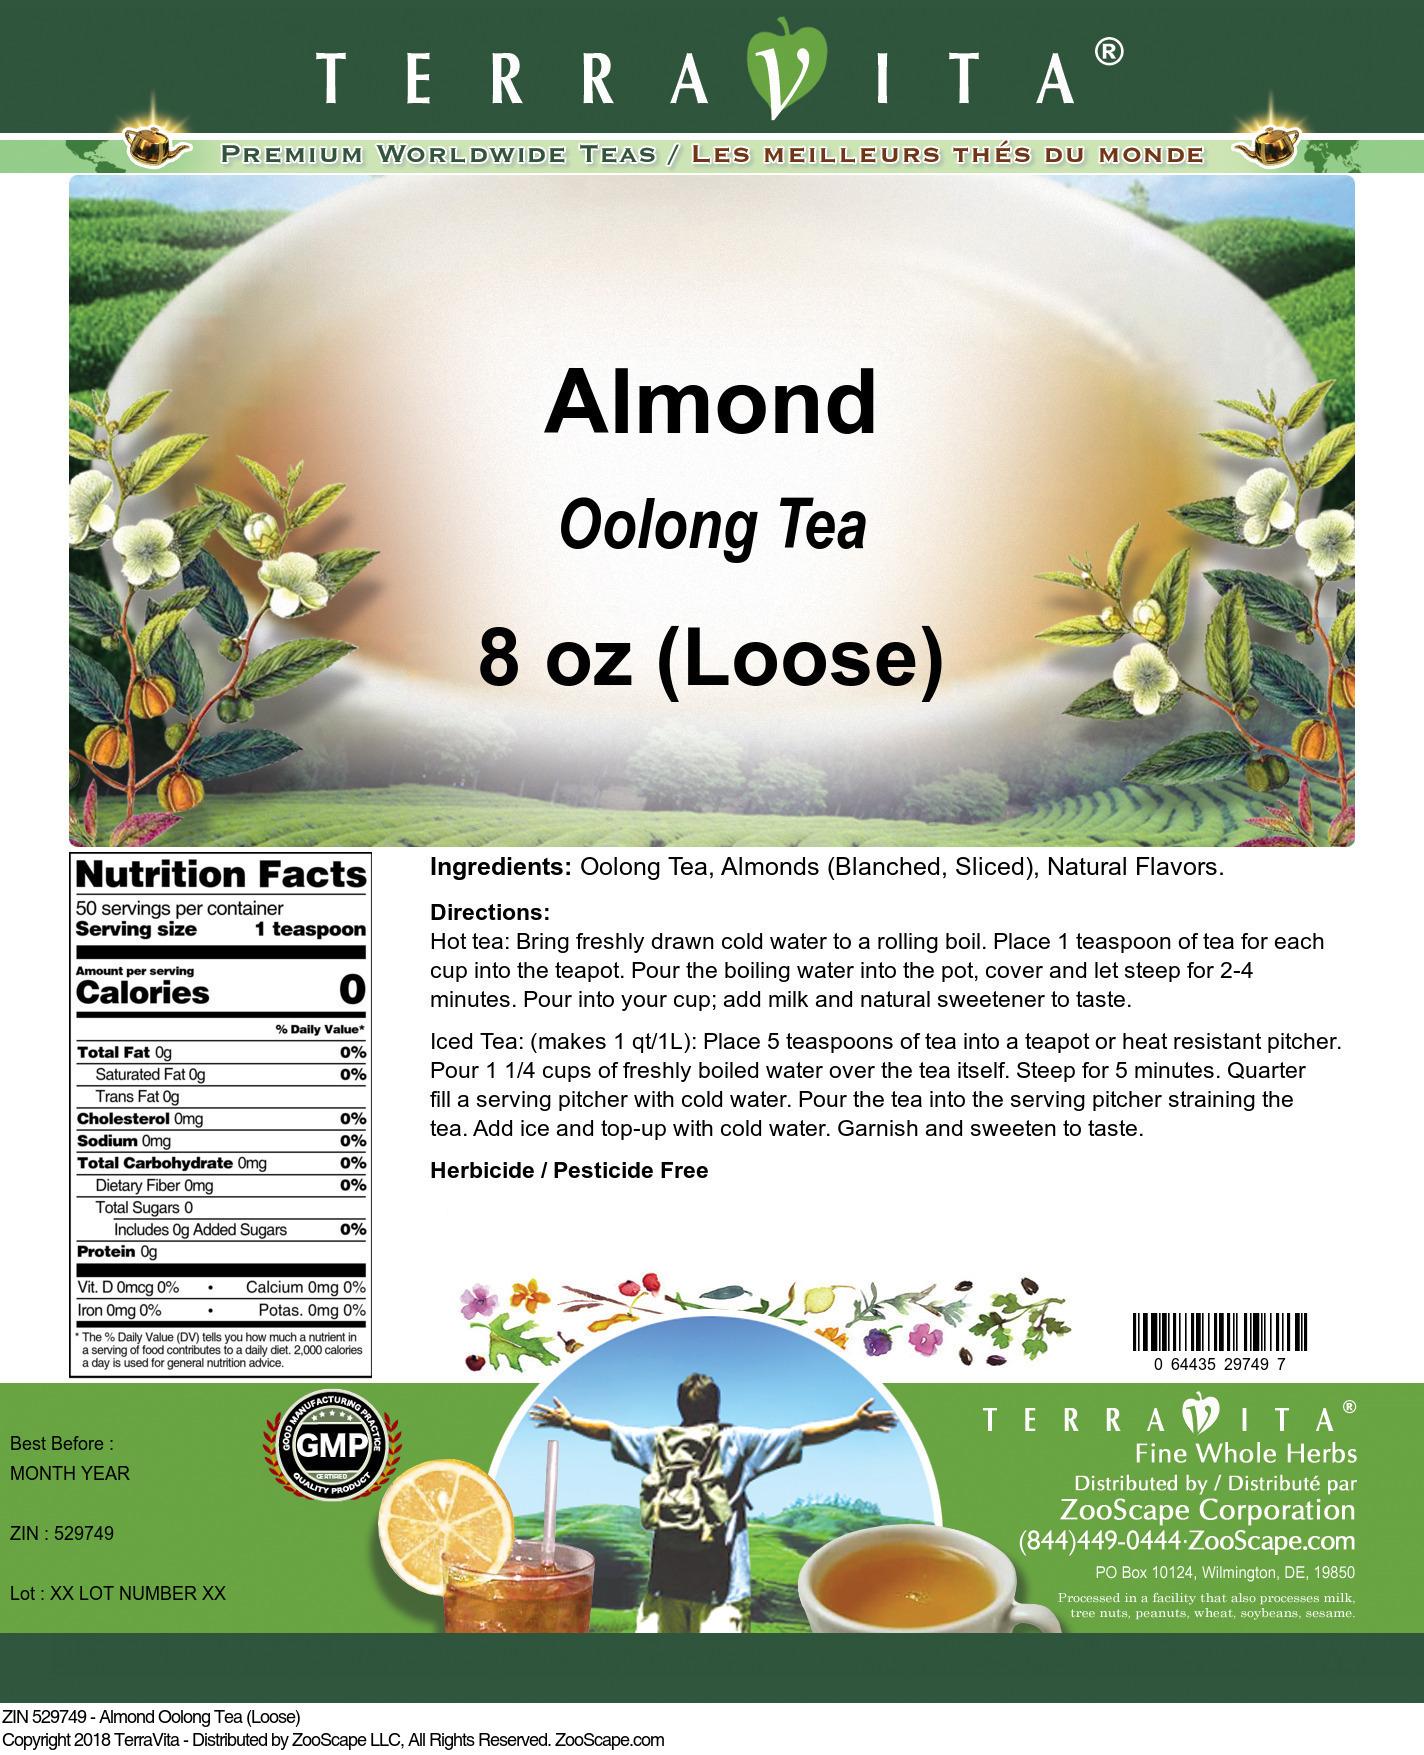 Almond Oolong Tea (Loose)